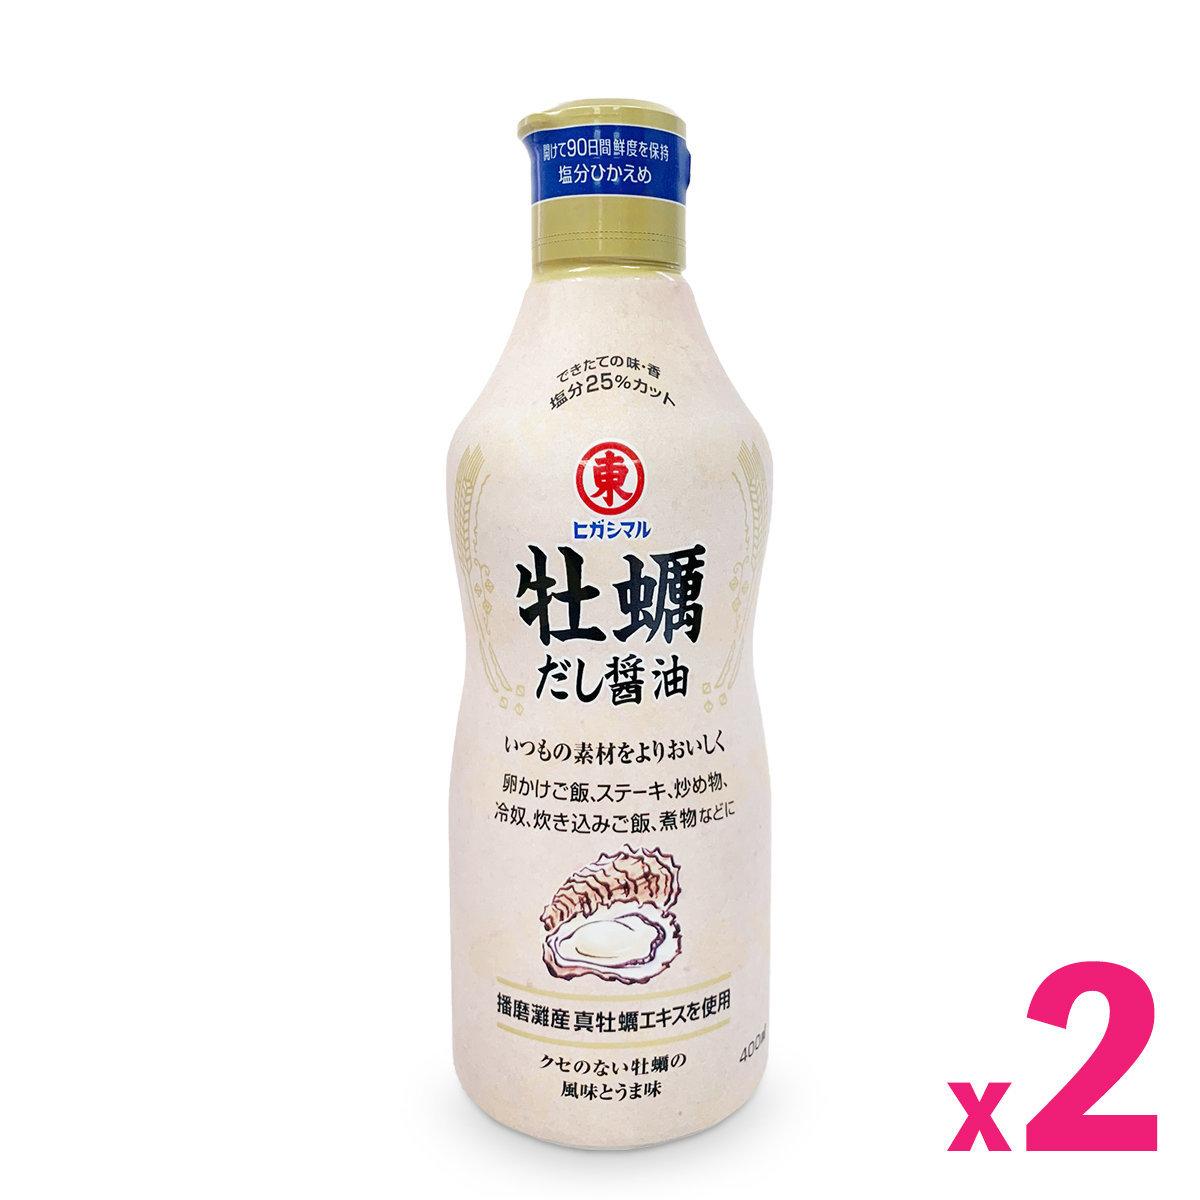 Japan Harima Nada Oyster Sauce (400ml) x 2bottles